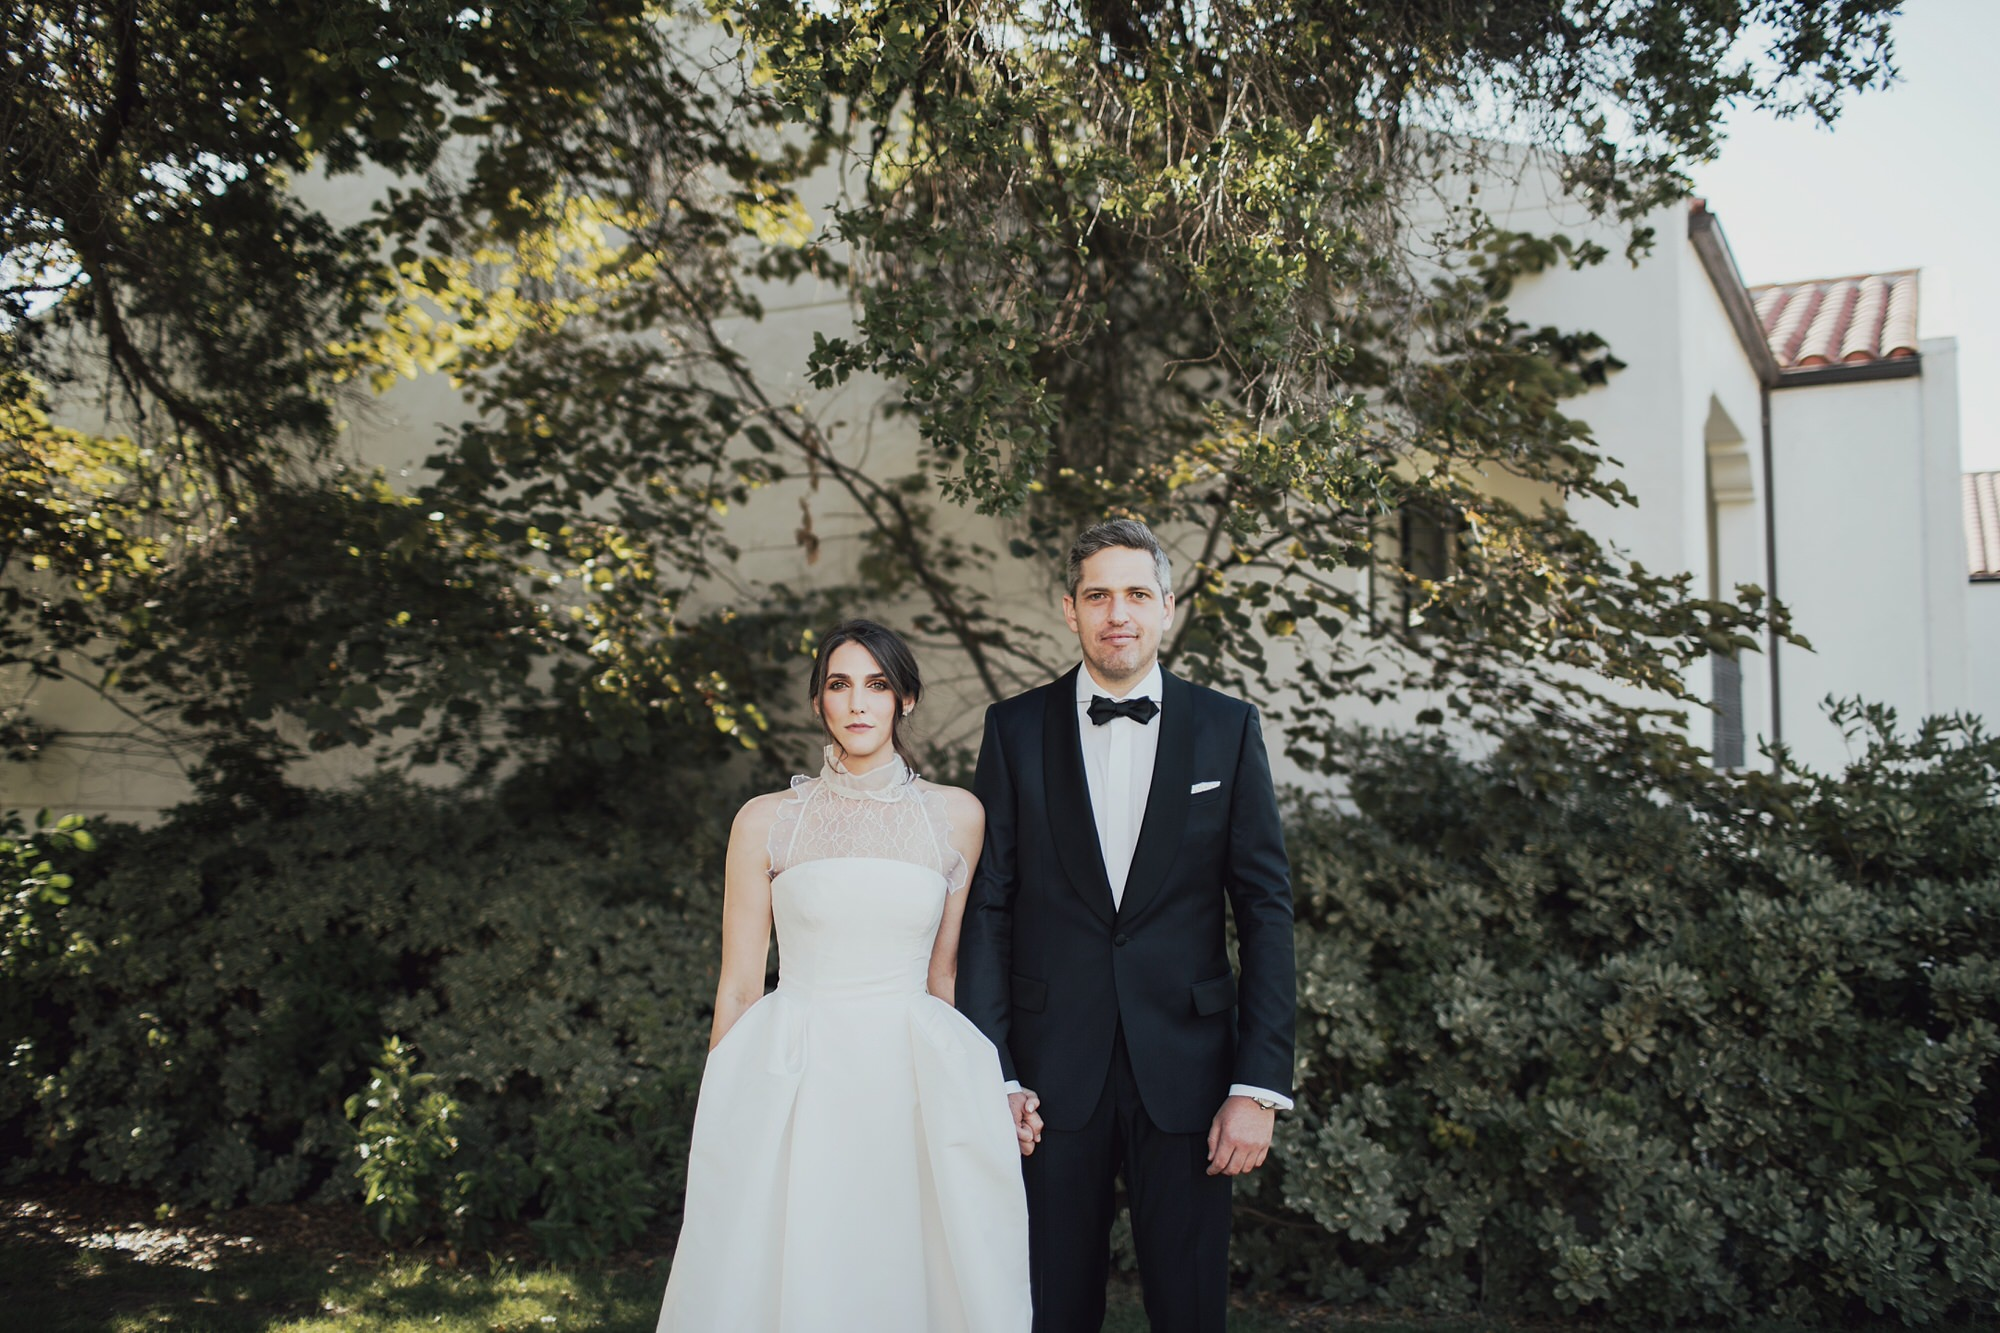 Ojai Wedding portraits at the Ojai Valley Inn